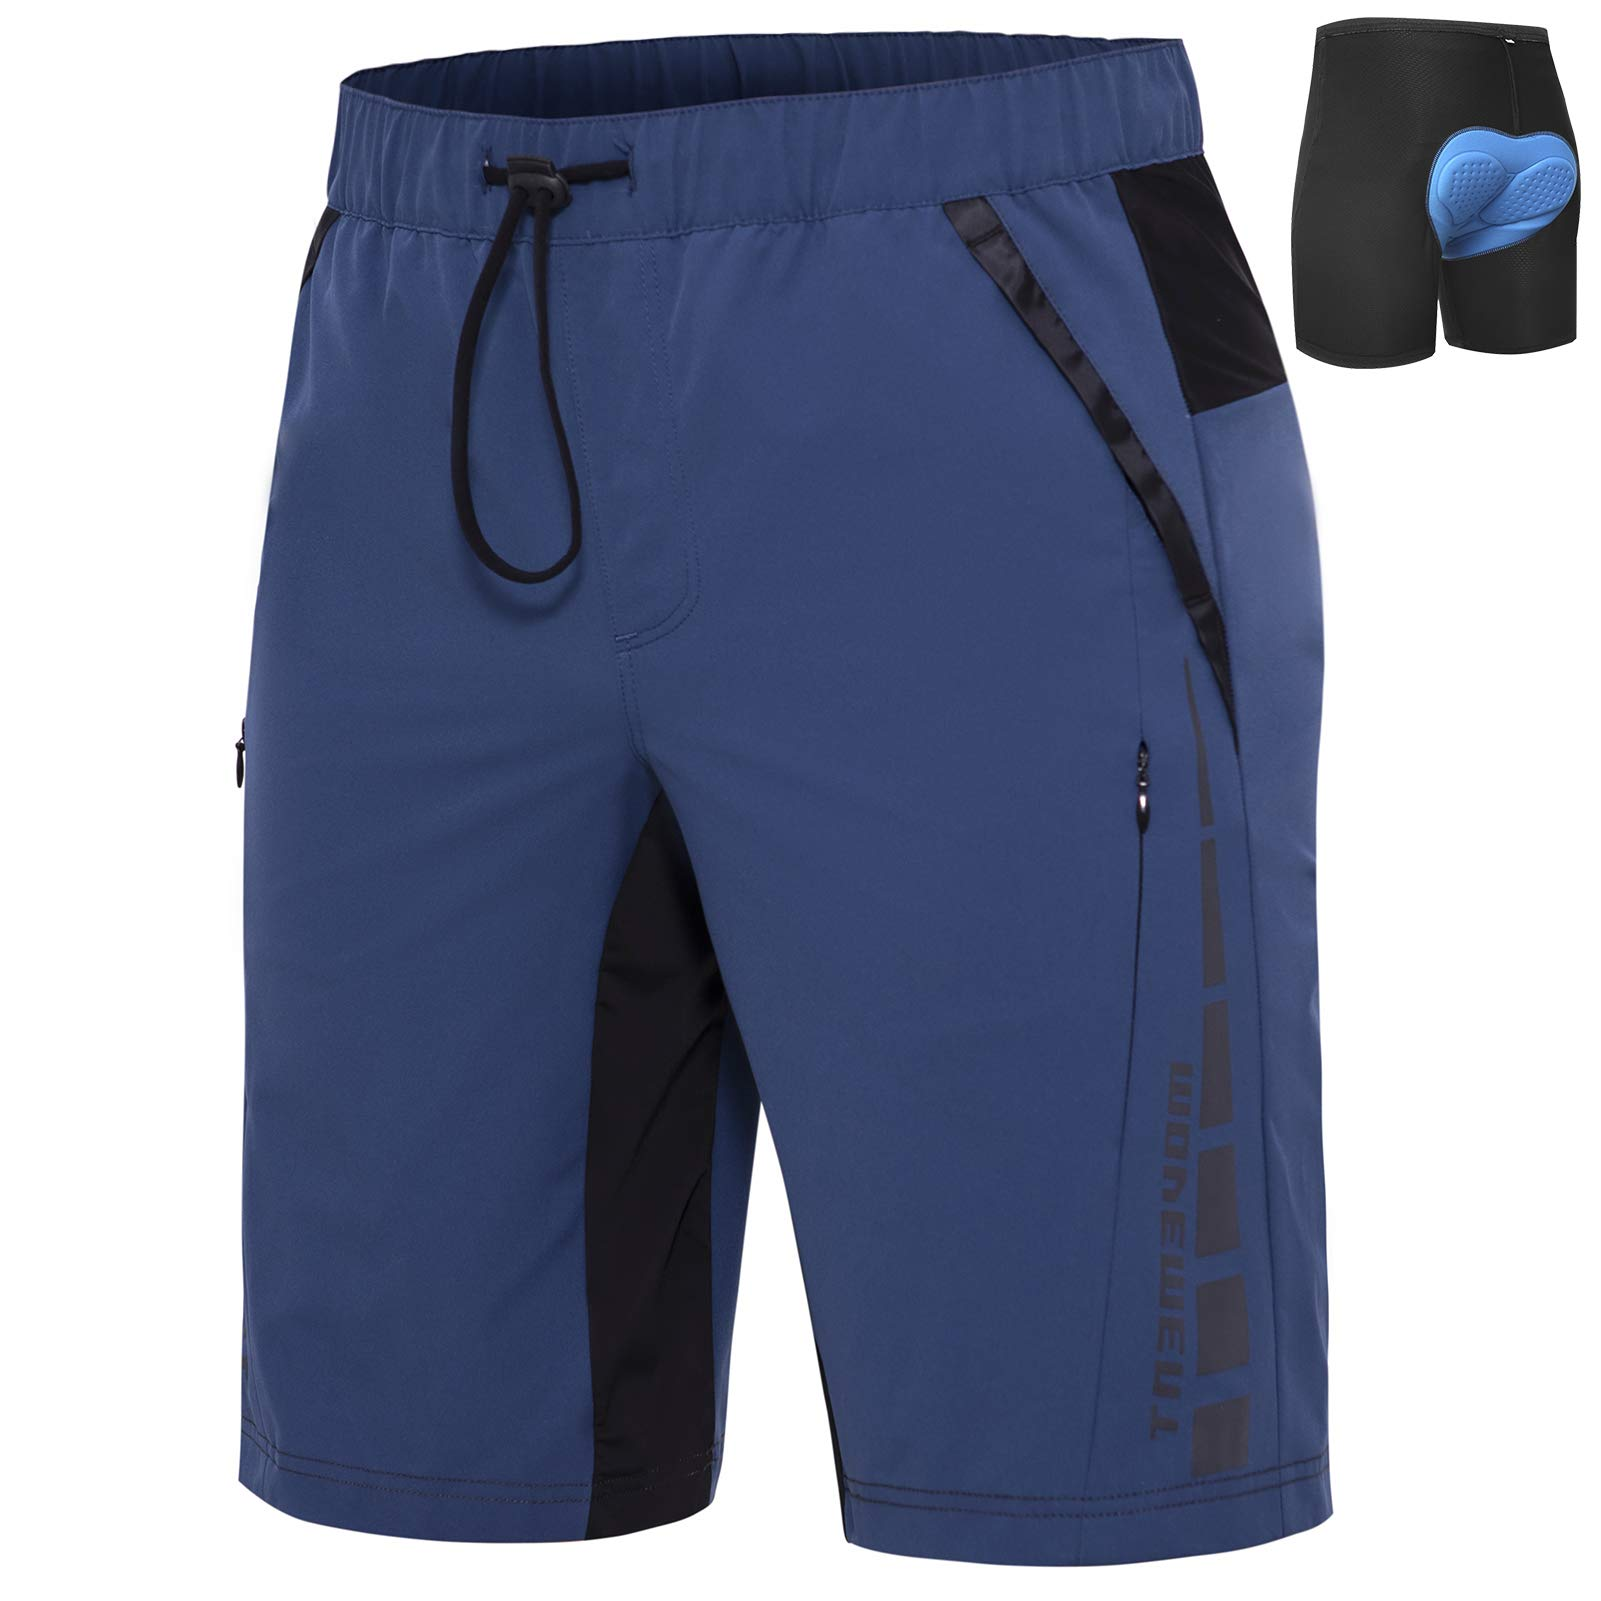 Cycorld Mens-Mountain-Bike-Shorts-Padded-Cycling-Shorts, Loose-Fit Quick Dry MTB Shorts for Men with Pockets